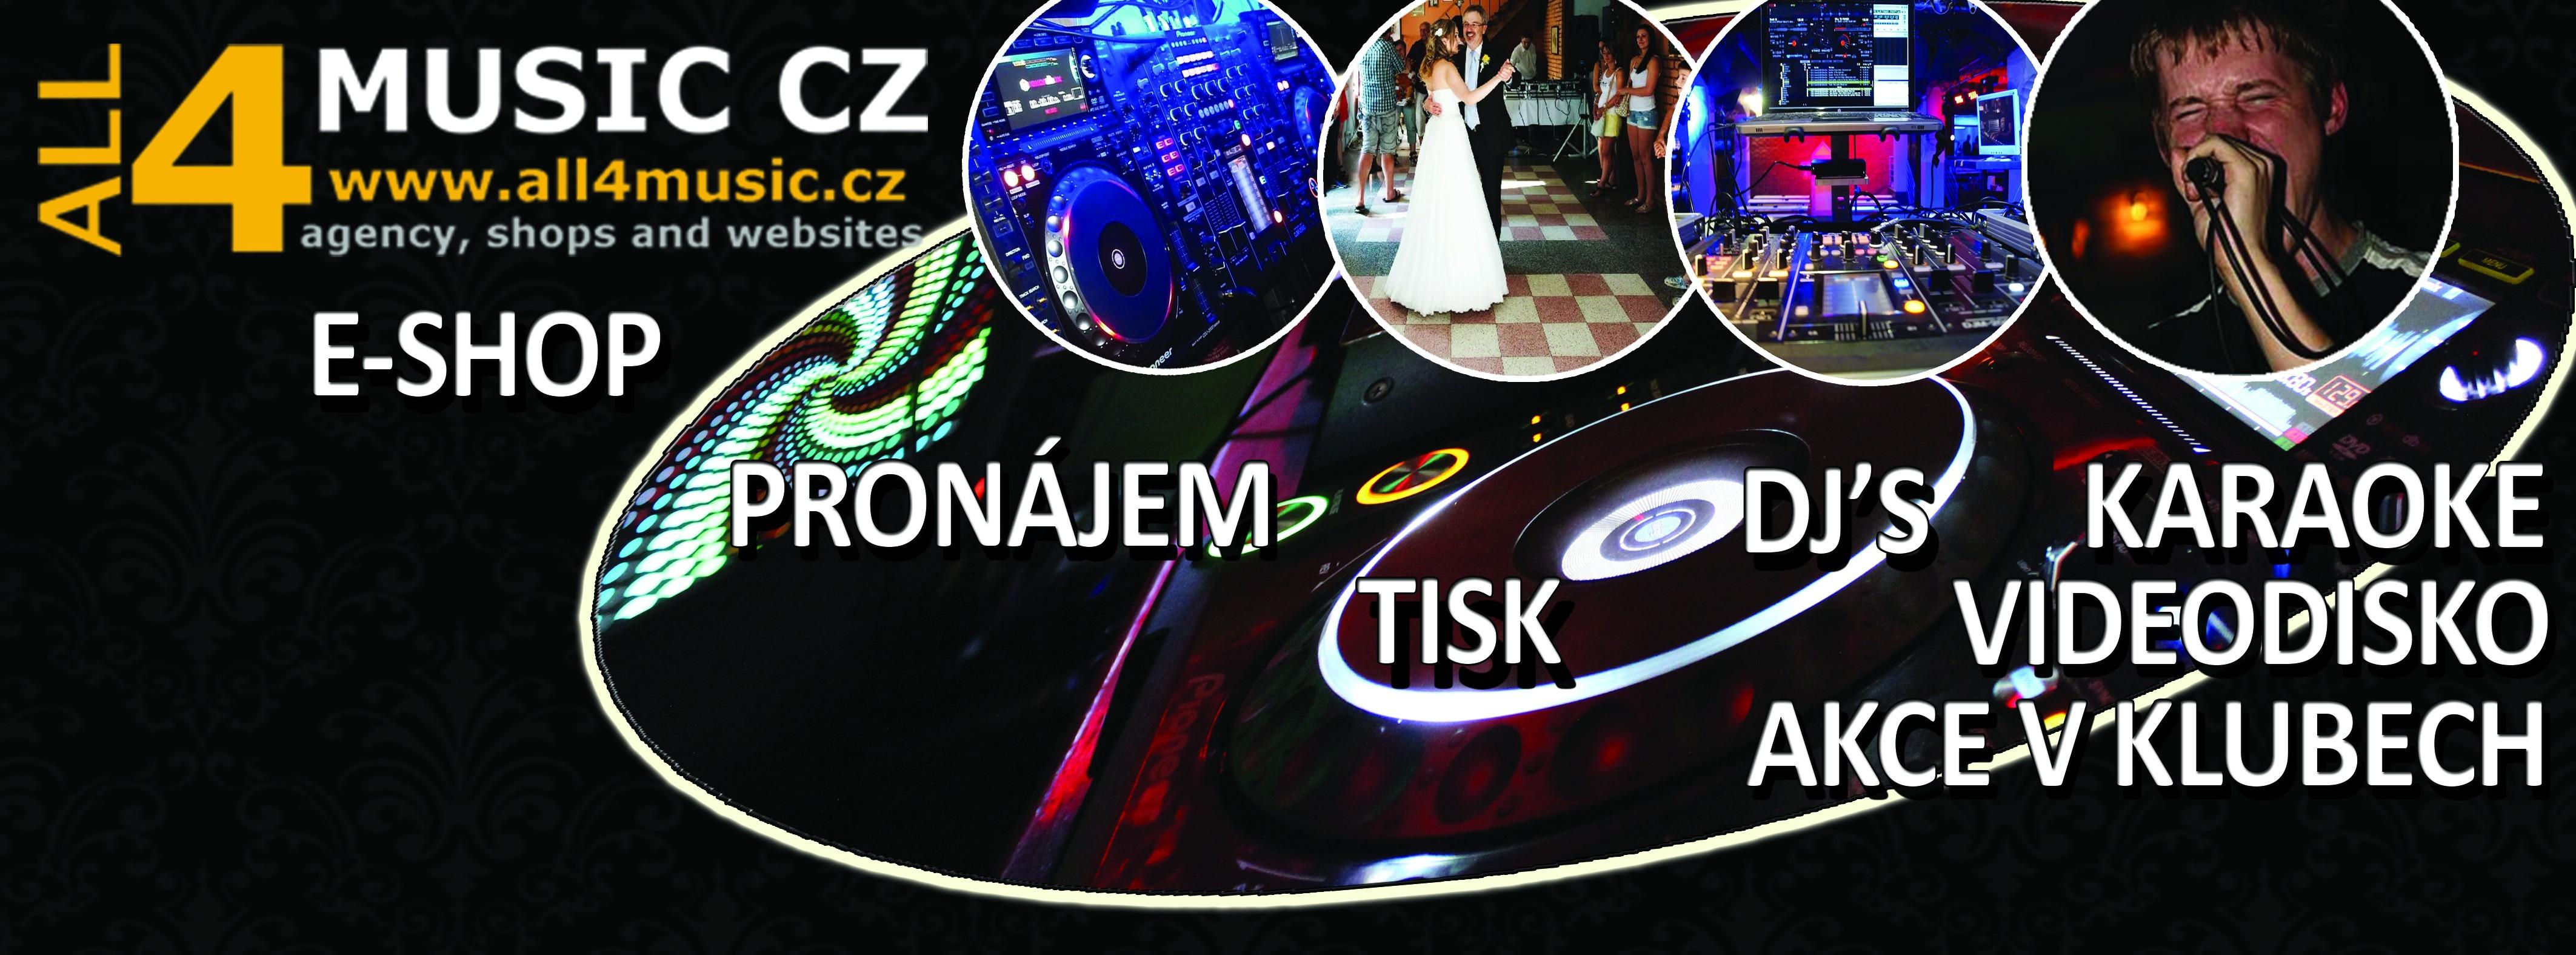 Hudební agentura, djs na akce a ozvučení Praha ALL4MUSIC